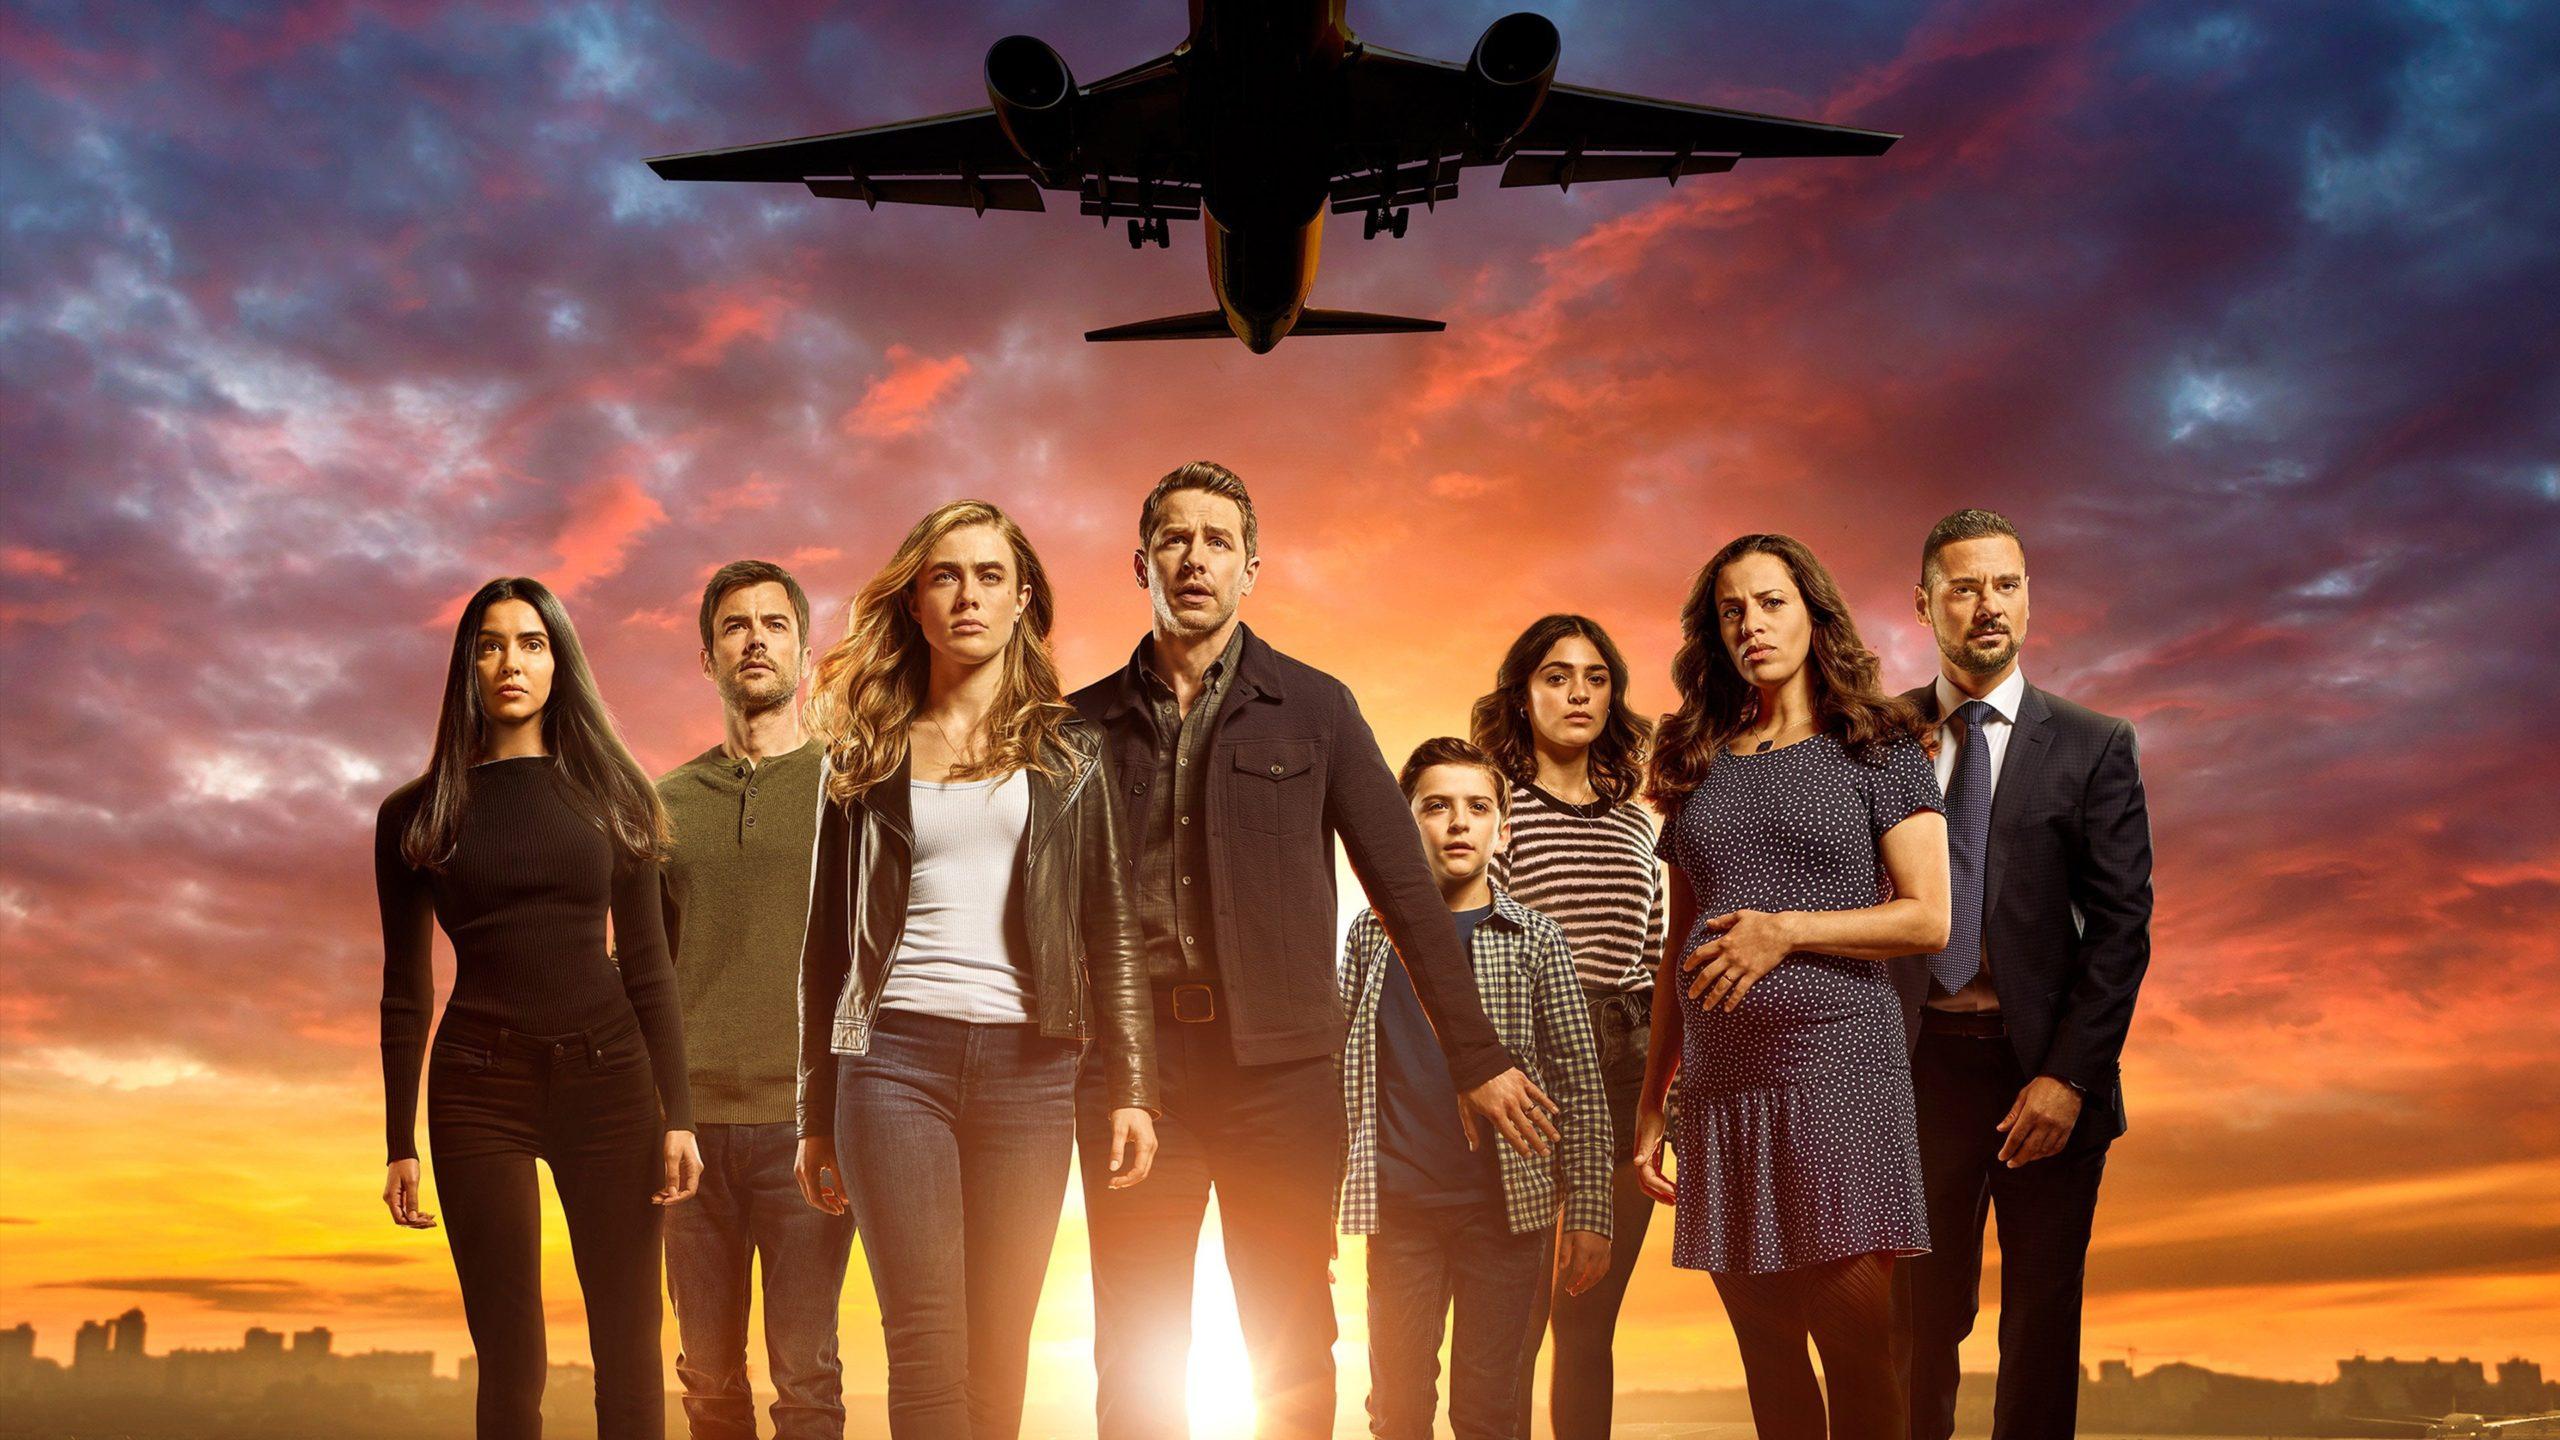 Manifest Season 4 Release Date | Will the series return for Season 4?